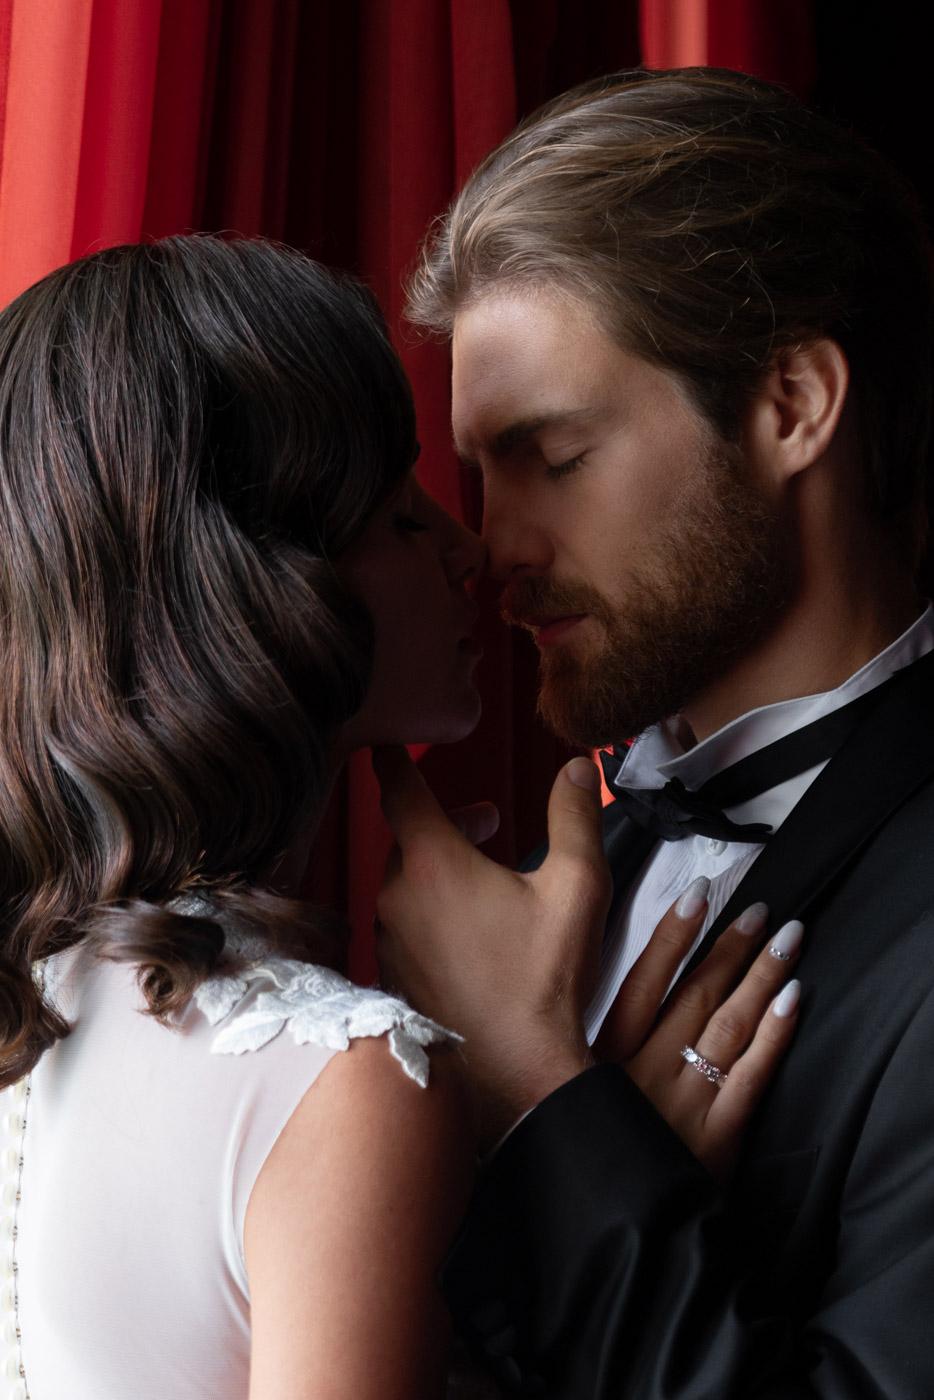 Bride and groom at Villa Astor, Sorrento, Italy - photo by Adagion Studio